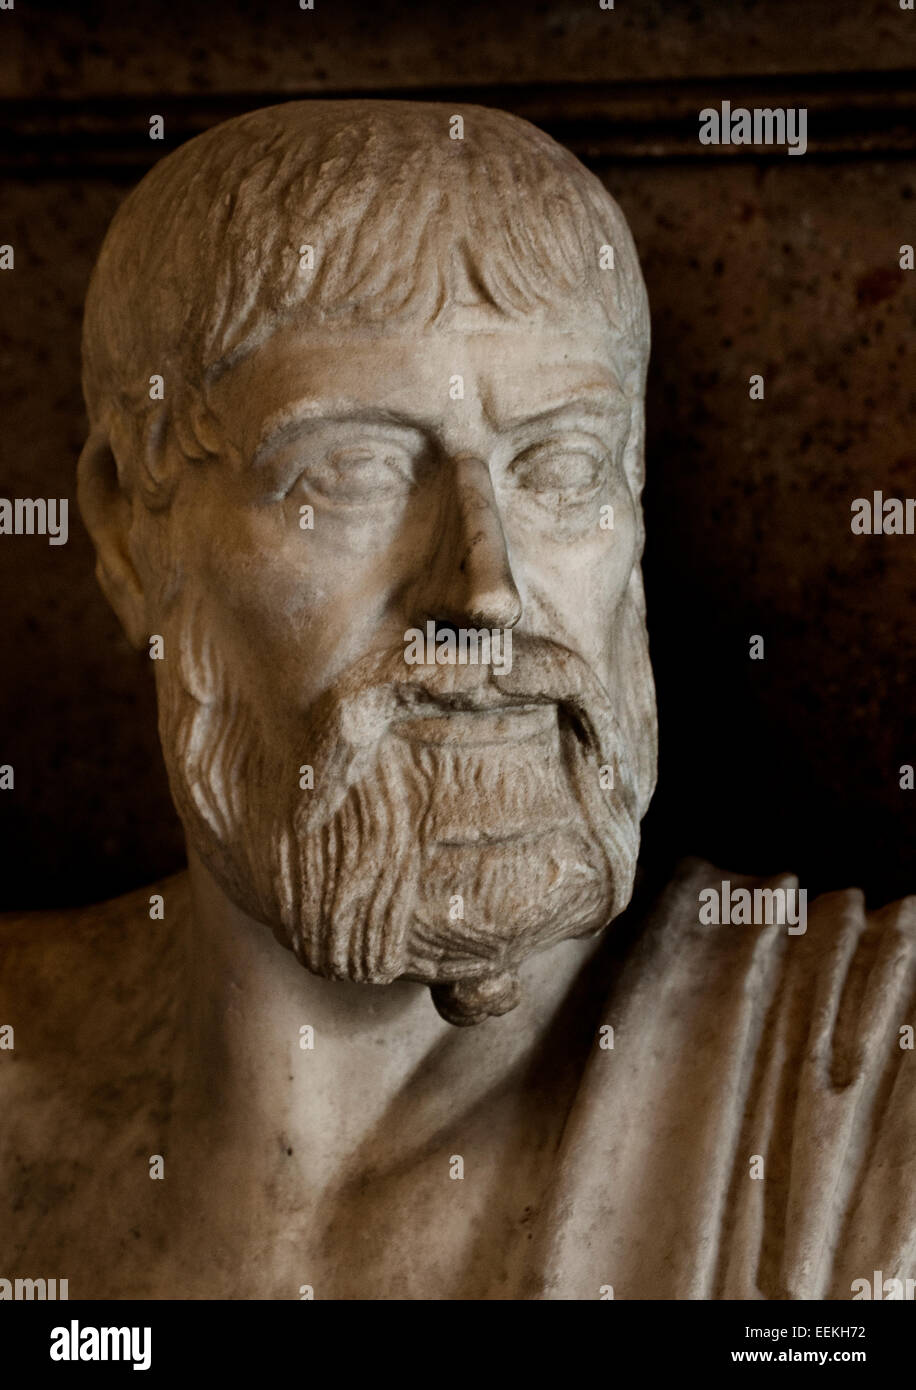 Pindaro Pindar Pindaros 522 –  443 BC  was an Ancient Greek lyric poet from Thebes. Roman Rome Capitoline Museum - Stock Image